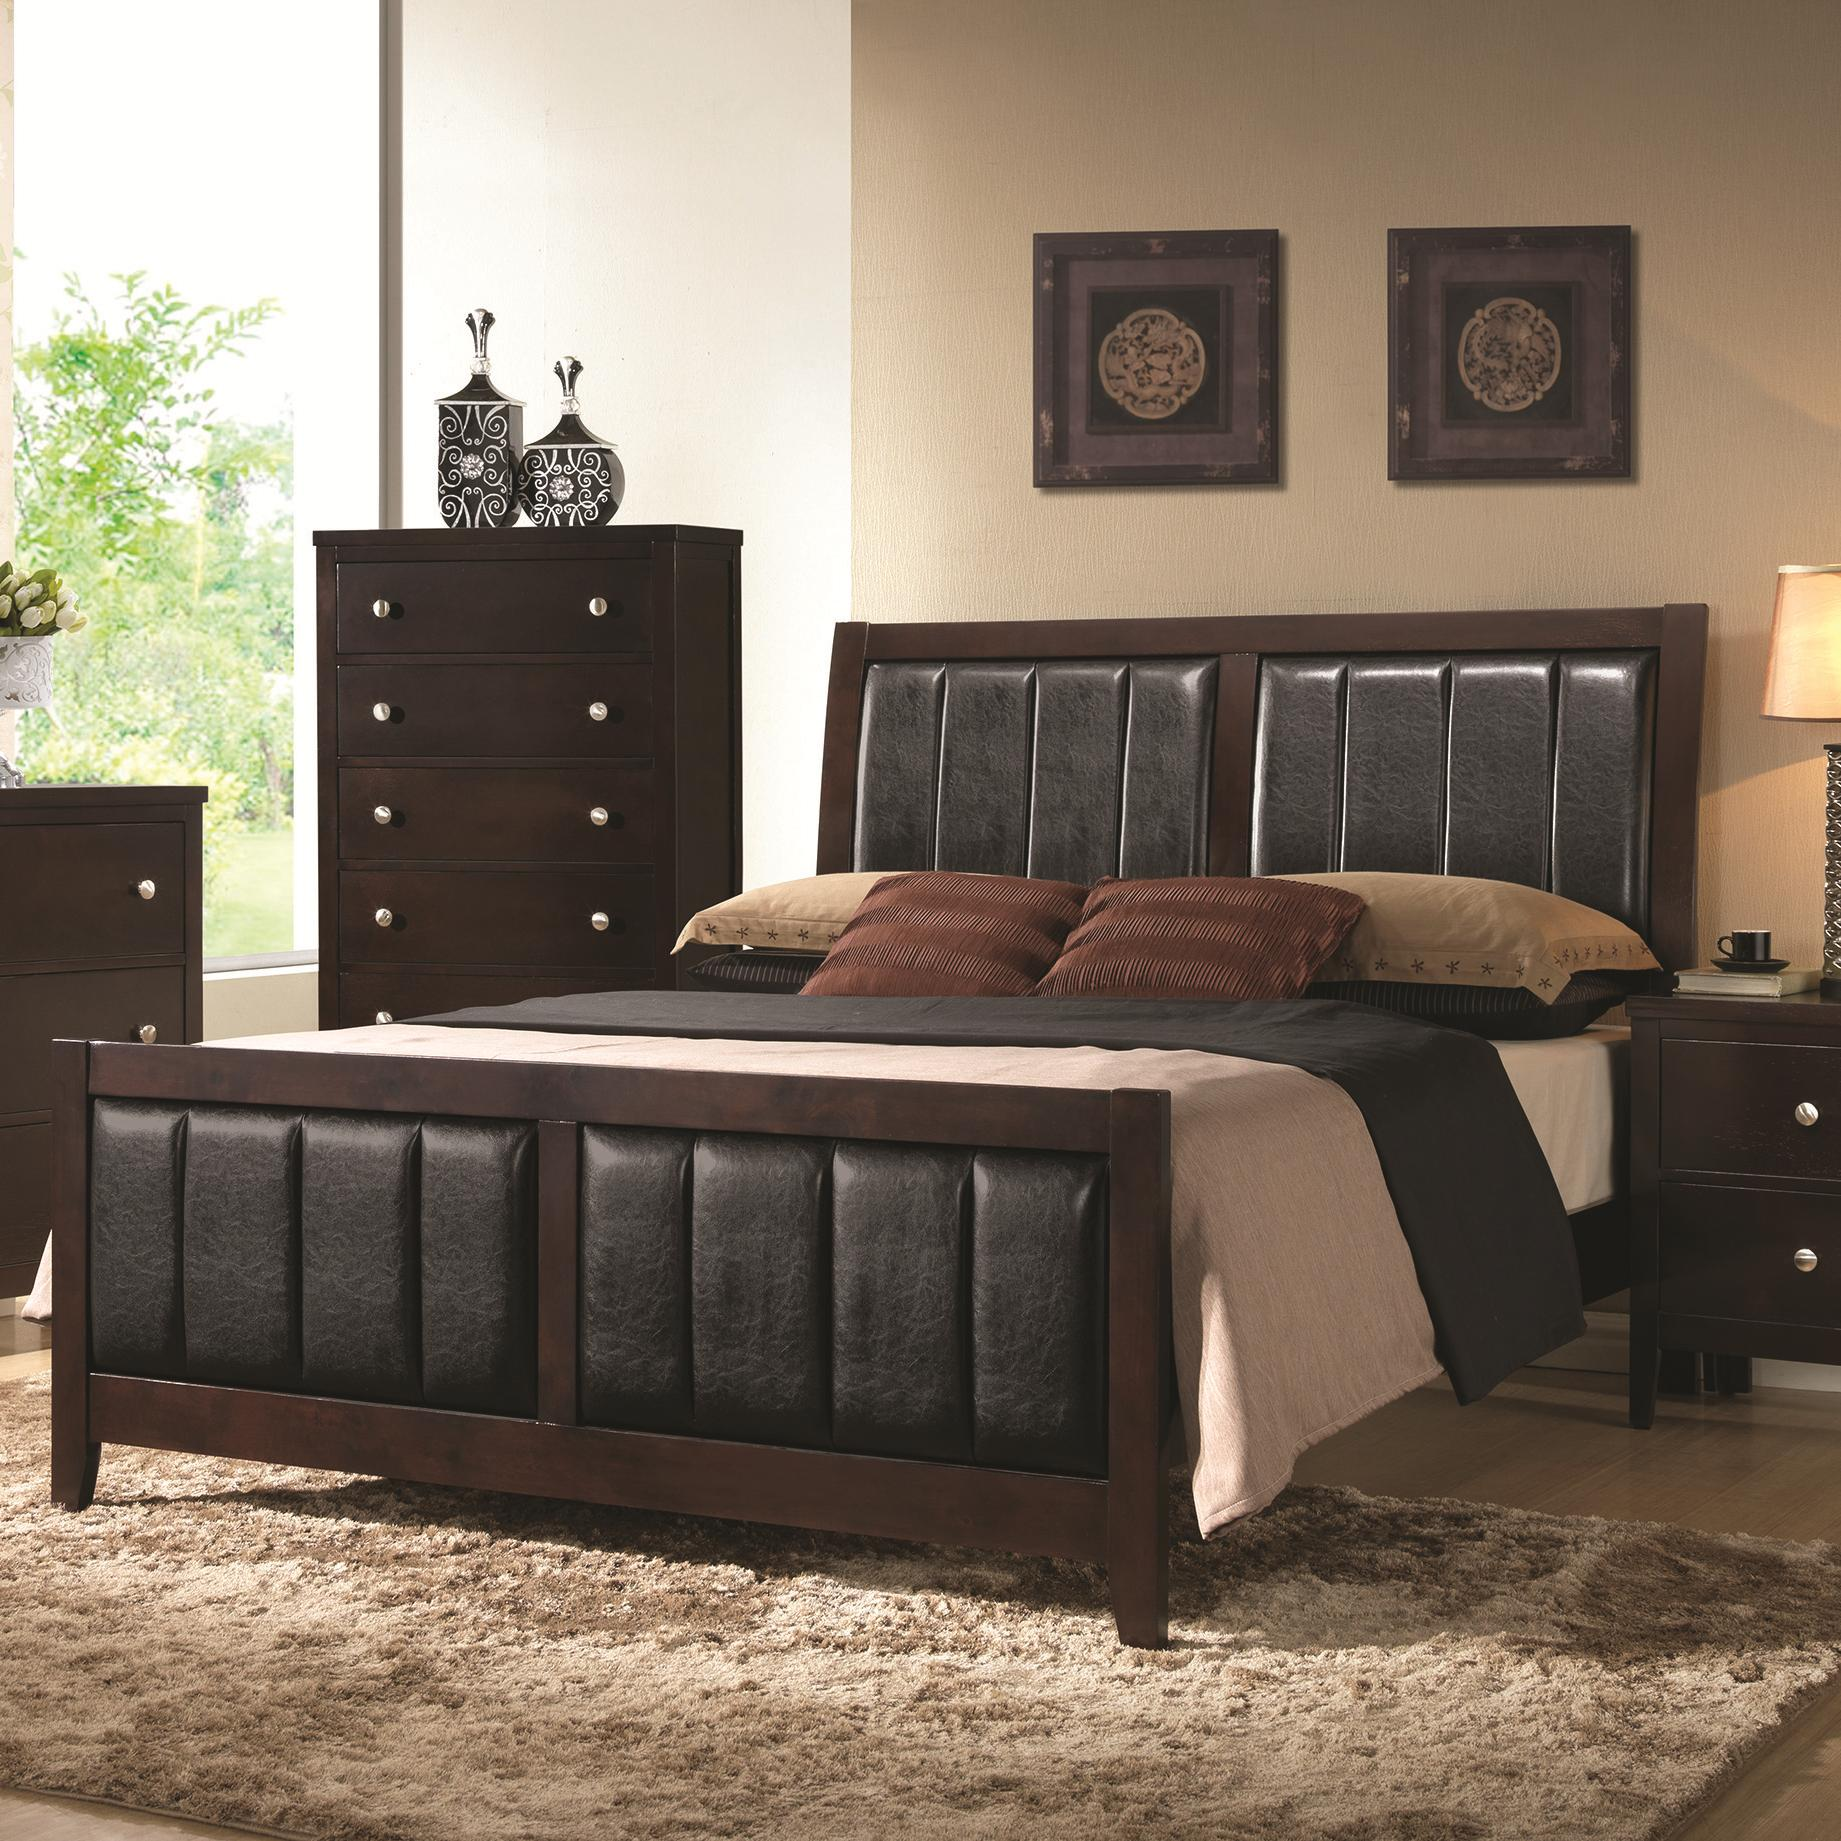 carlton queen bed